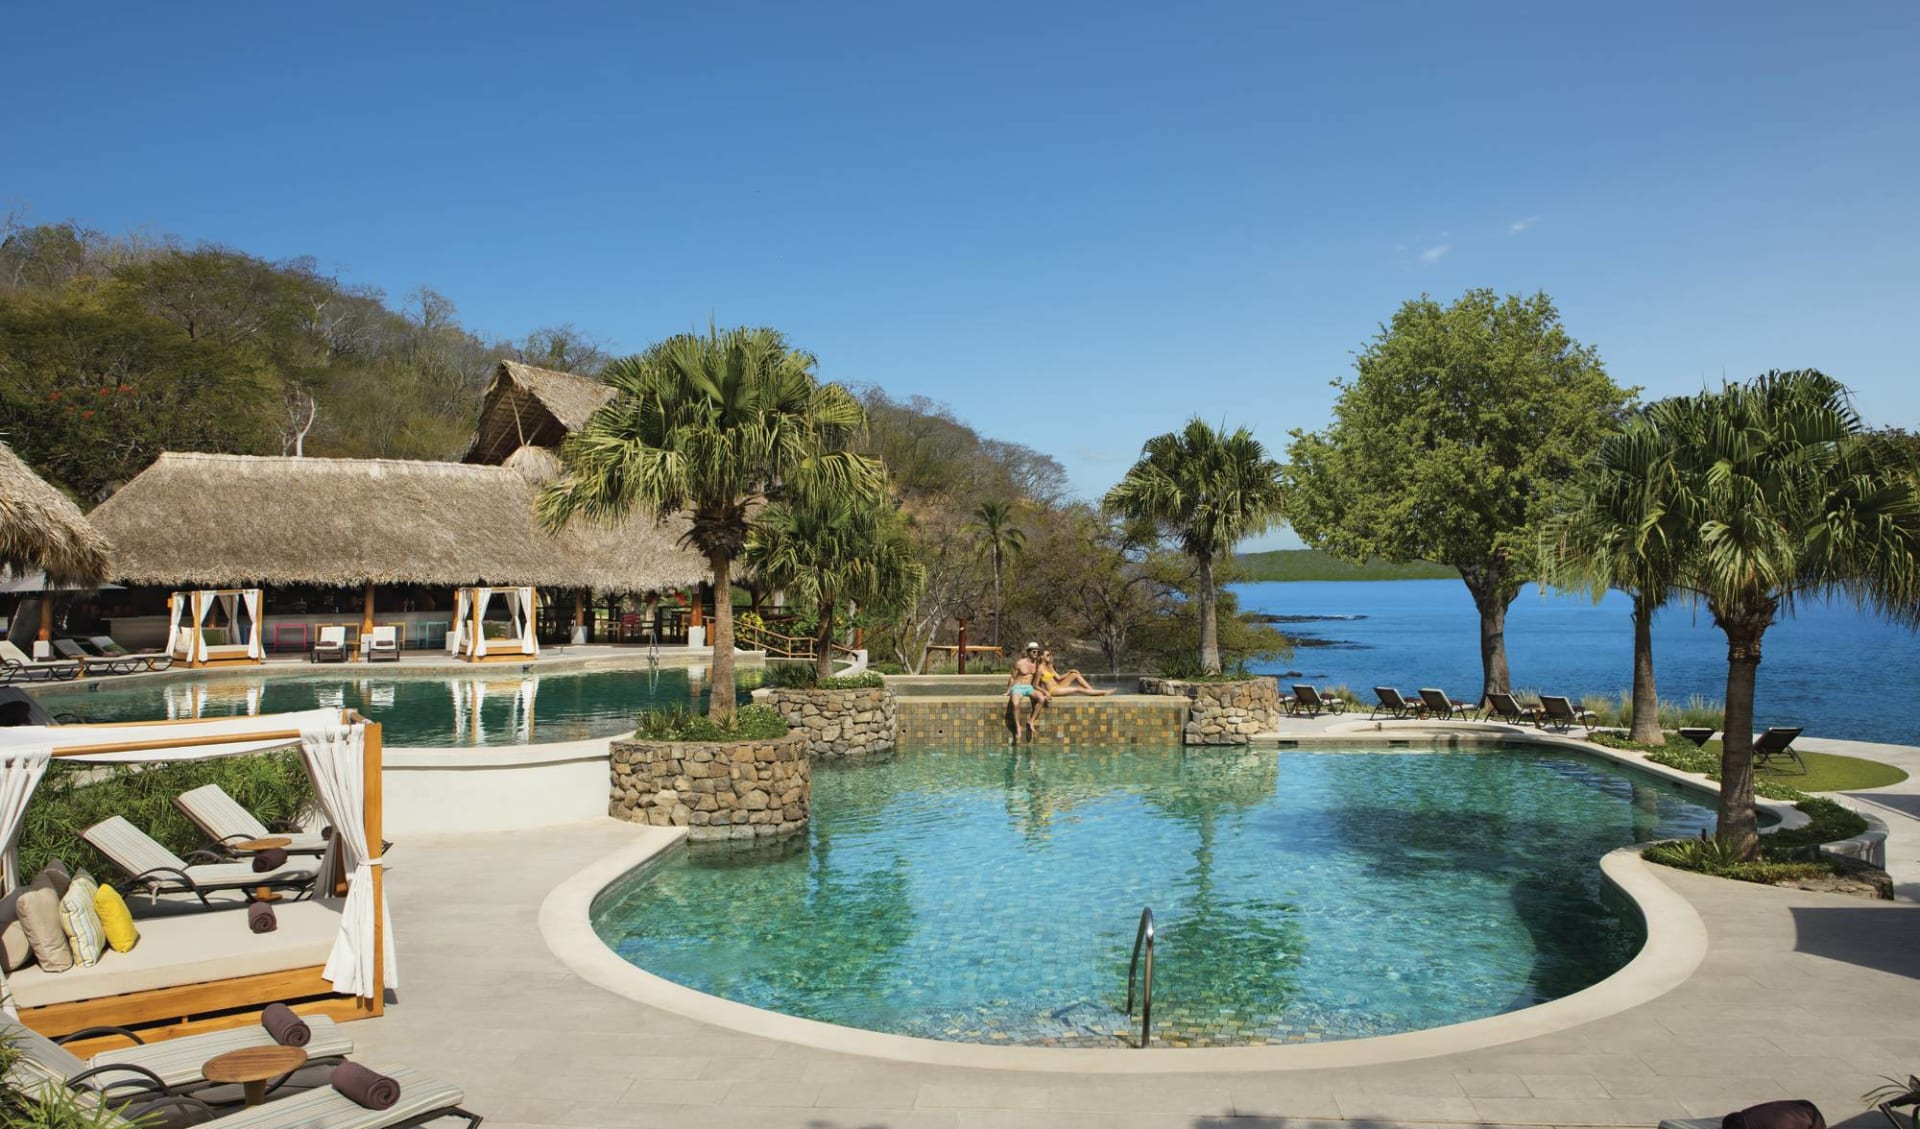 Secrets Papagayo Costa Rica in Playa Arenilla: pool Secrets Papagayo - Hauptpool amresorts weblink